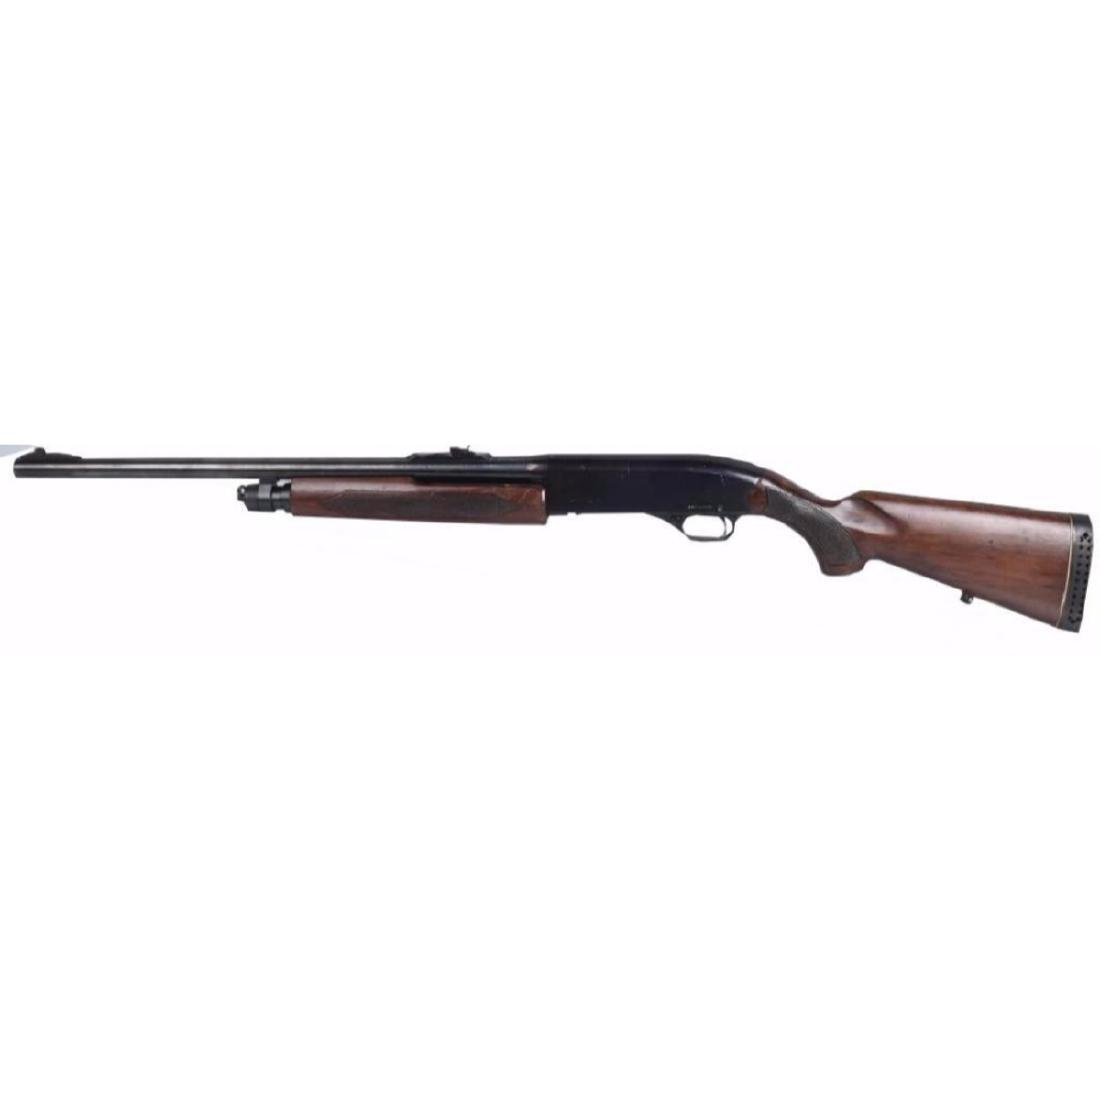 Winchester Model 1200 12 Ga Pump Shotgun